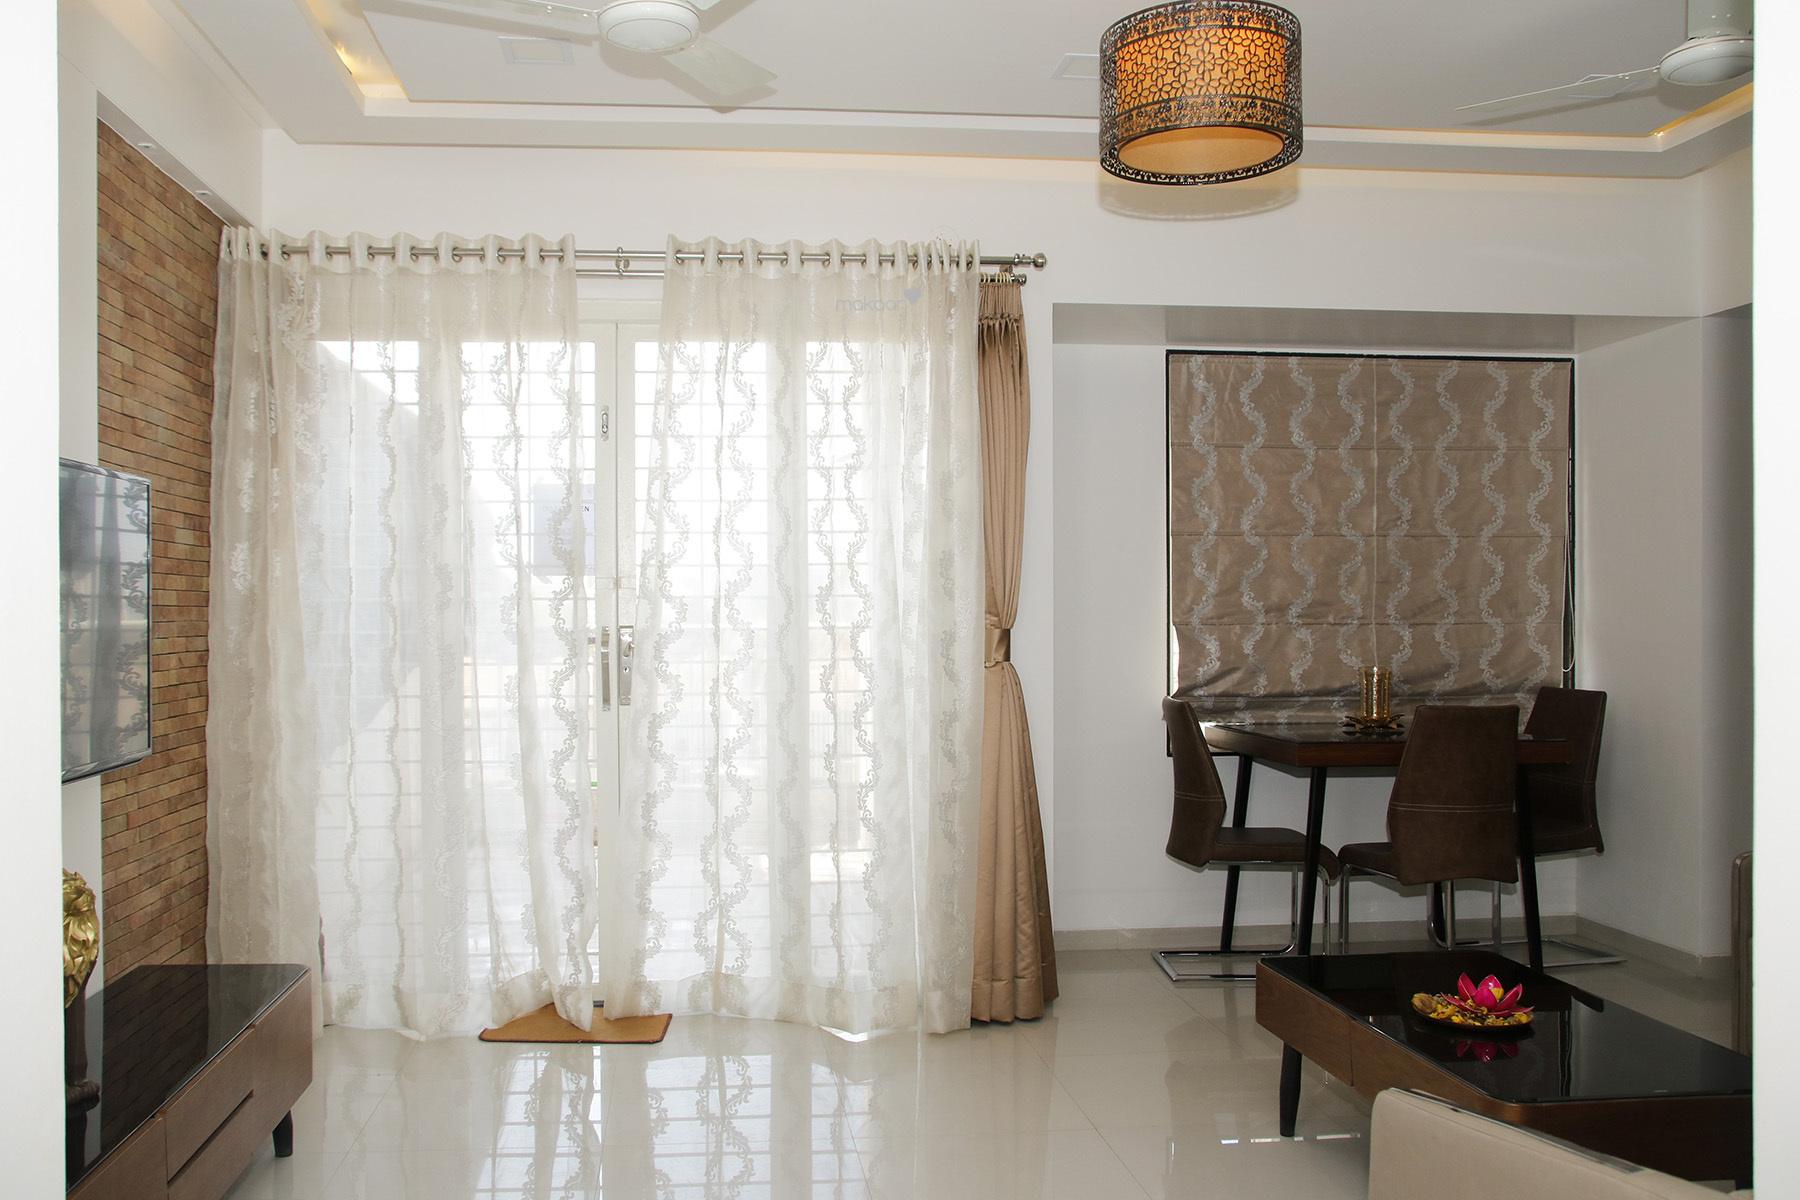 1023 sq ft 2BHK 2BHK+2T (1,023 sq ft) Property By Proptiger In Grandeur, Undri